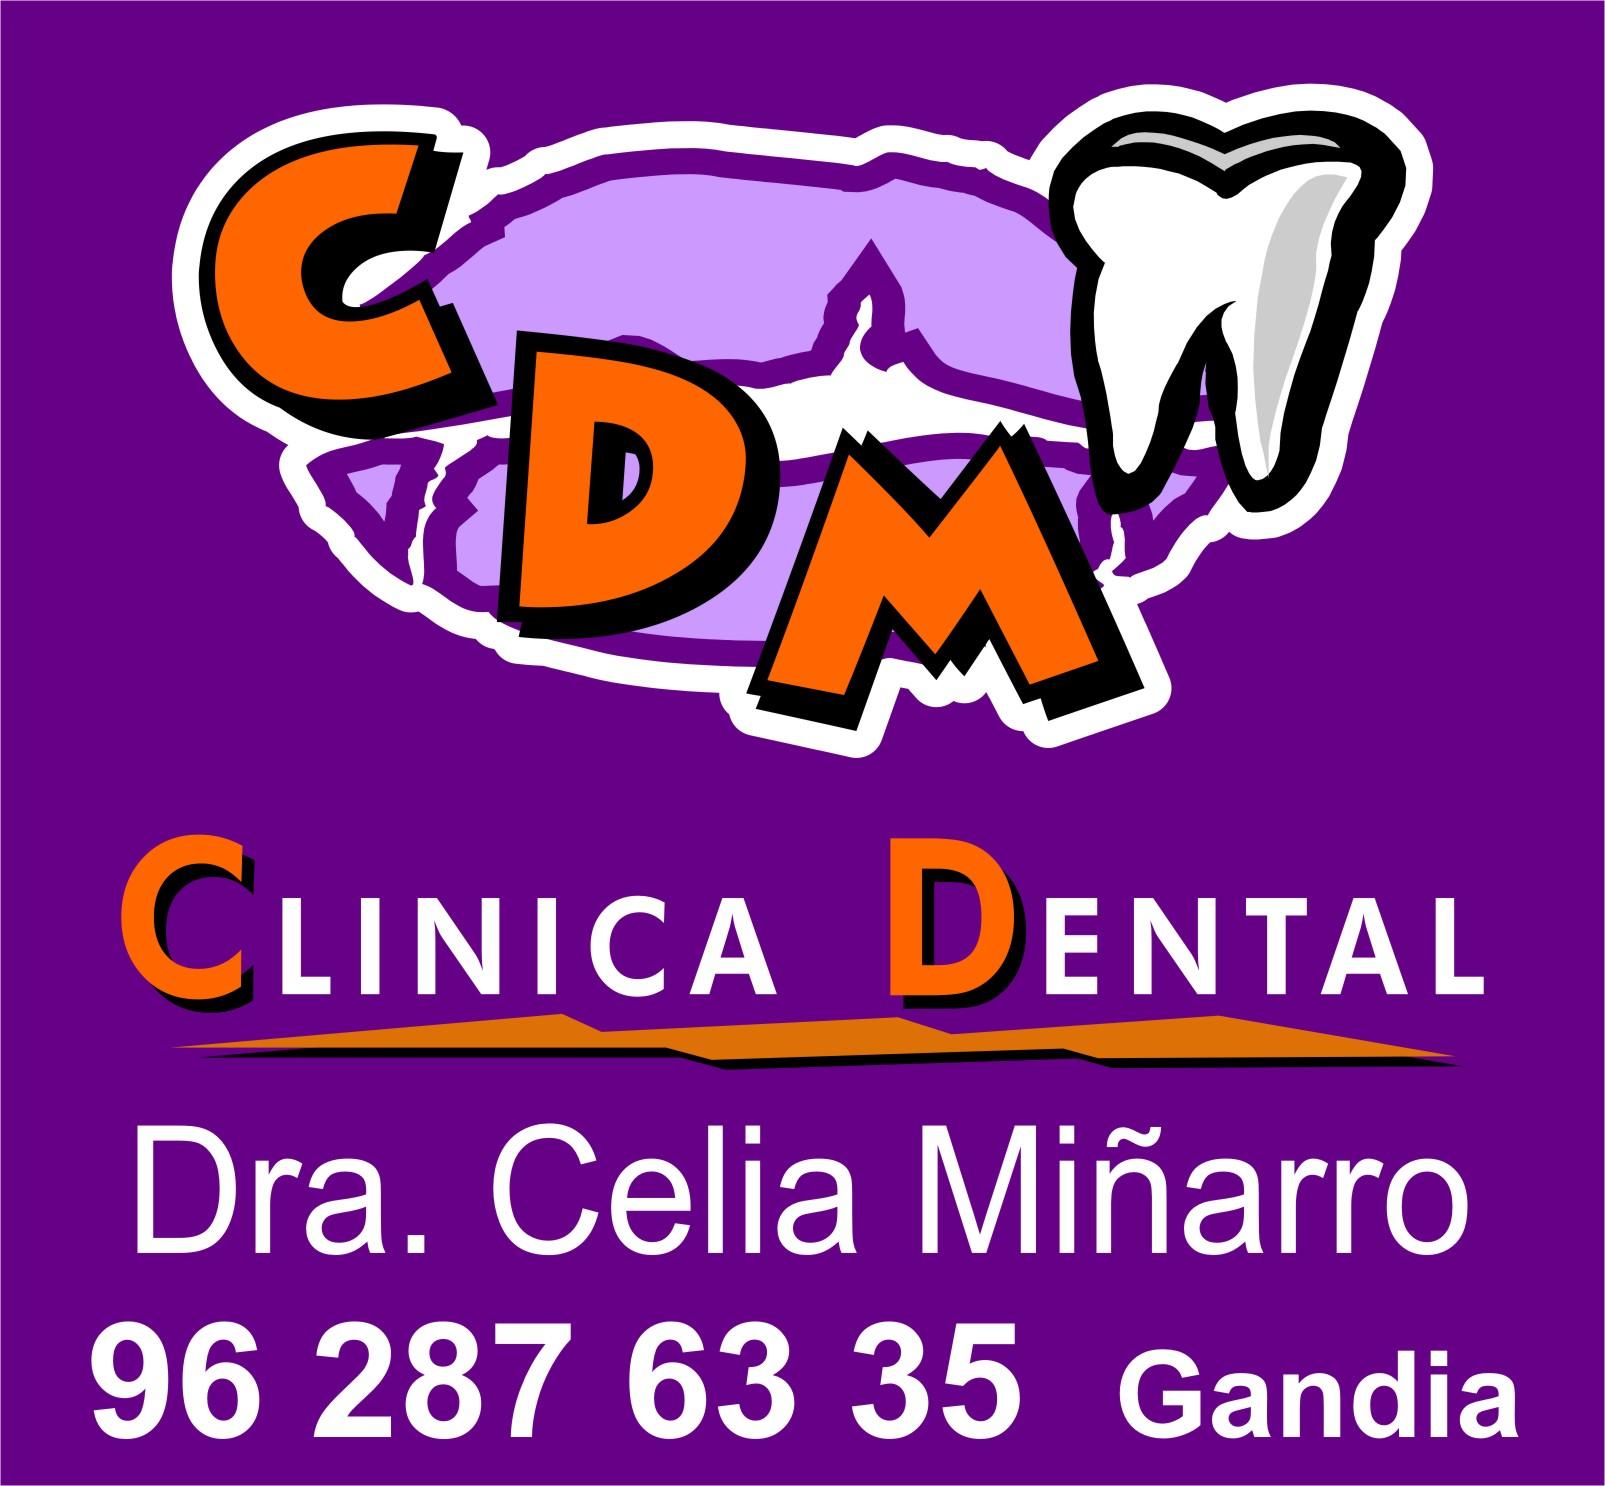 CLINICA DENTAL CELIA MIÑARRO